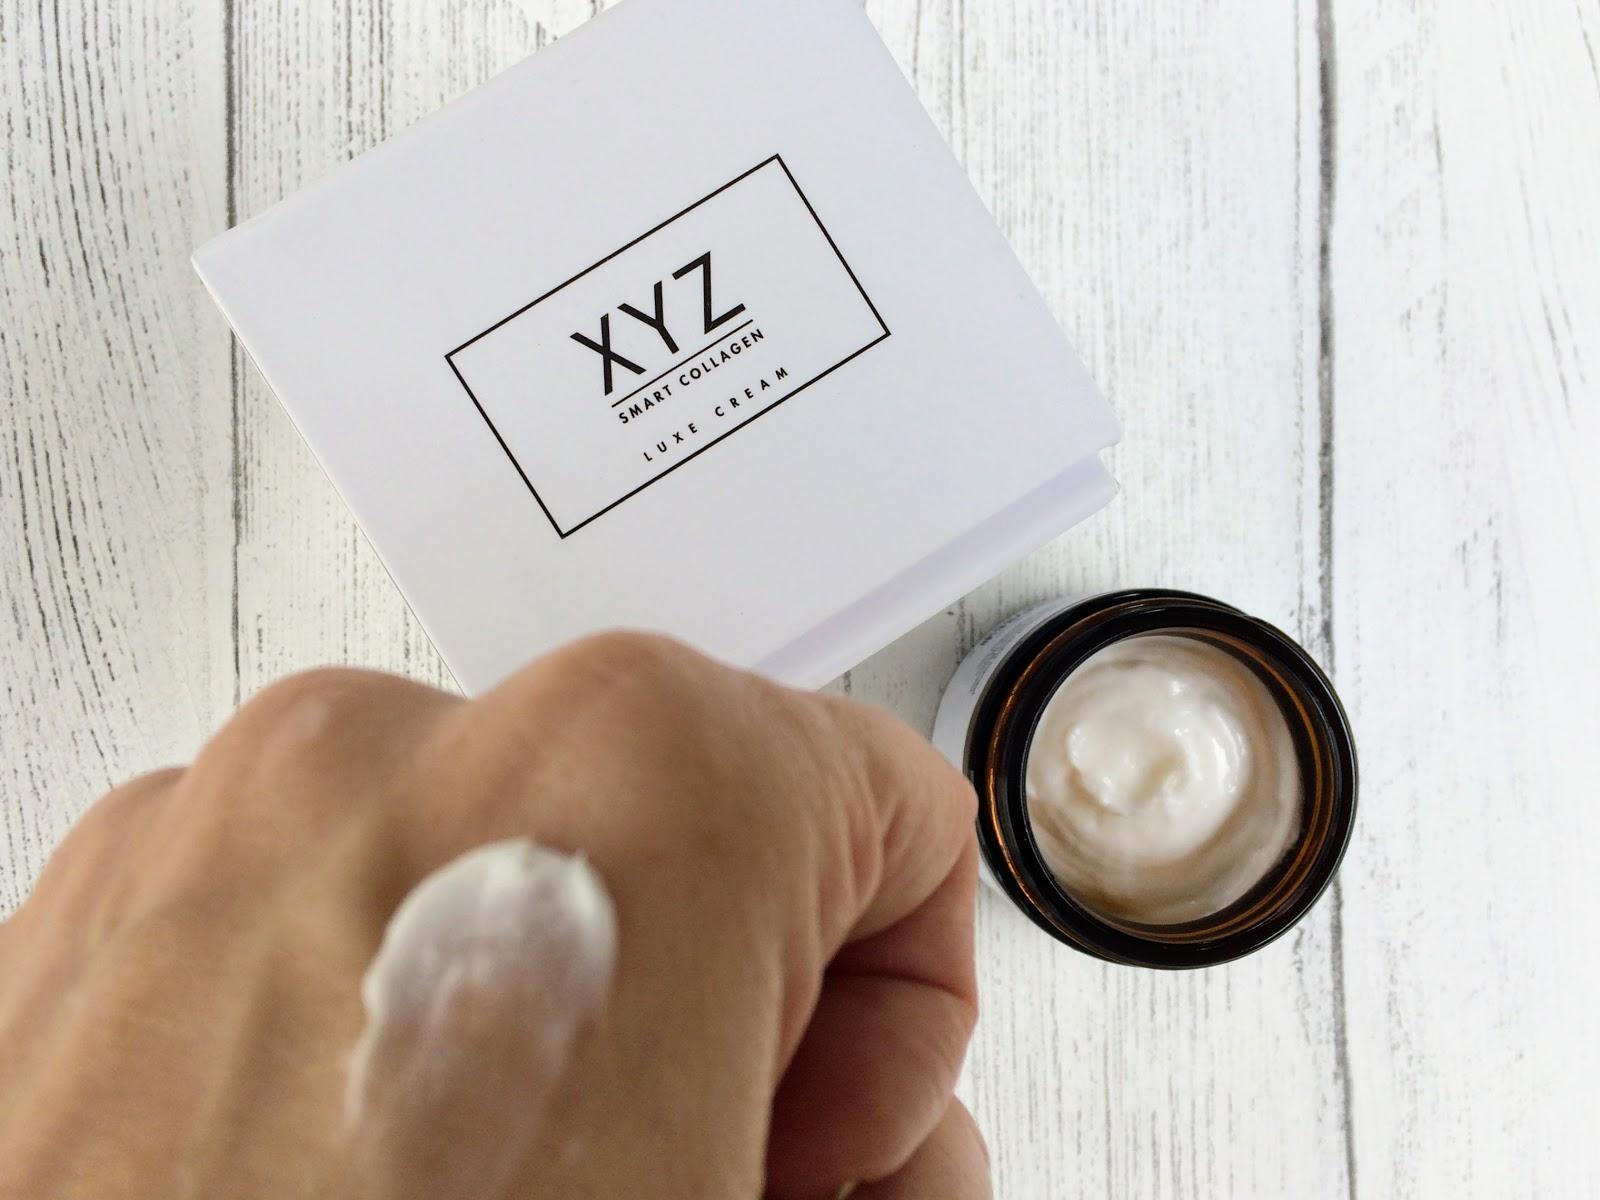 XYZ smart collagen on hand